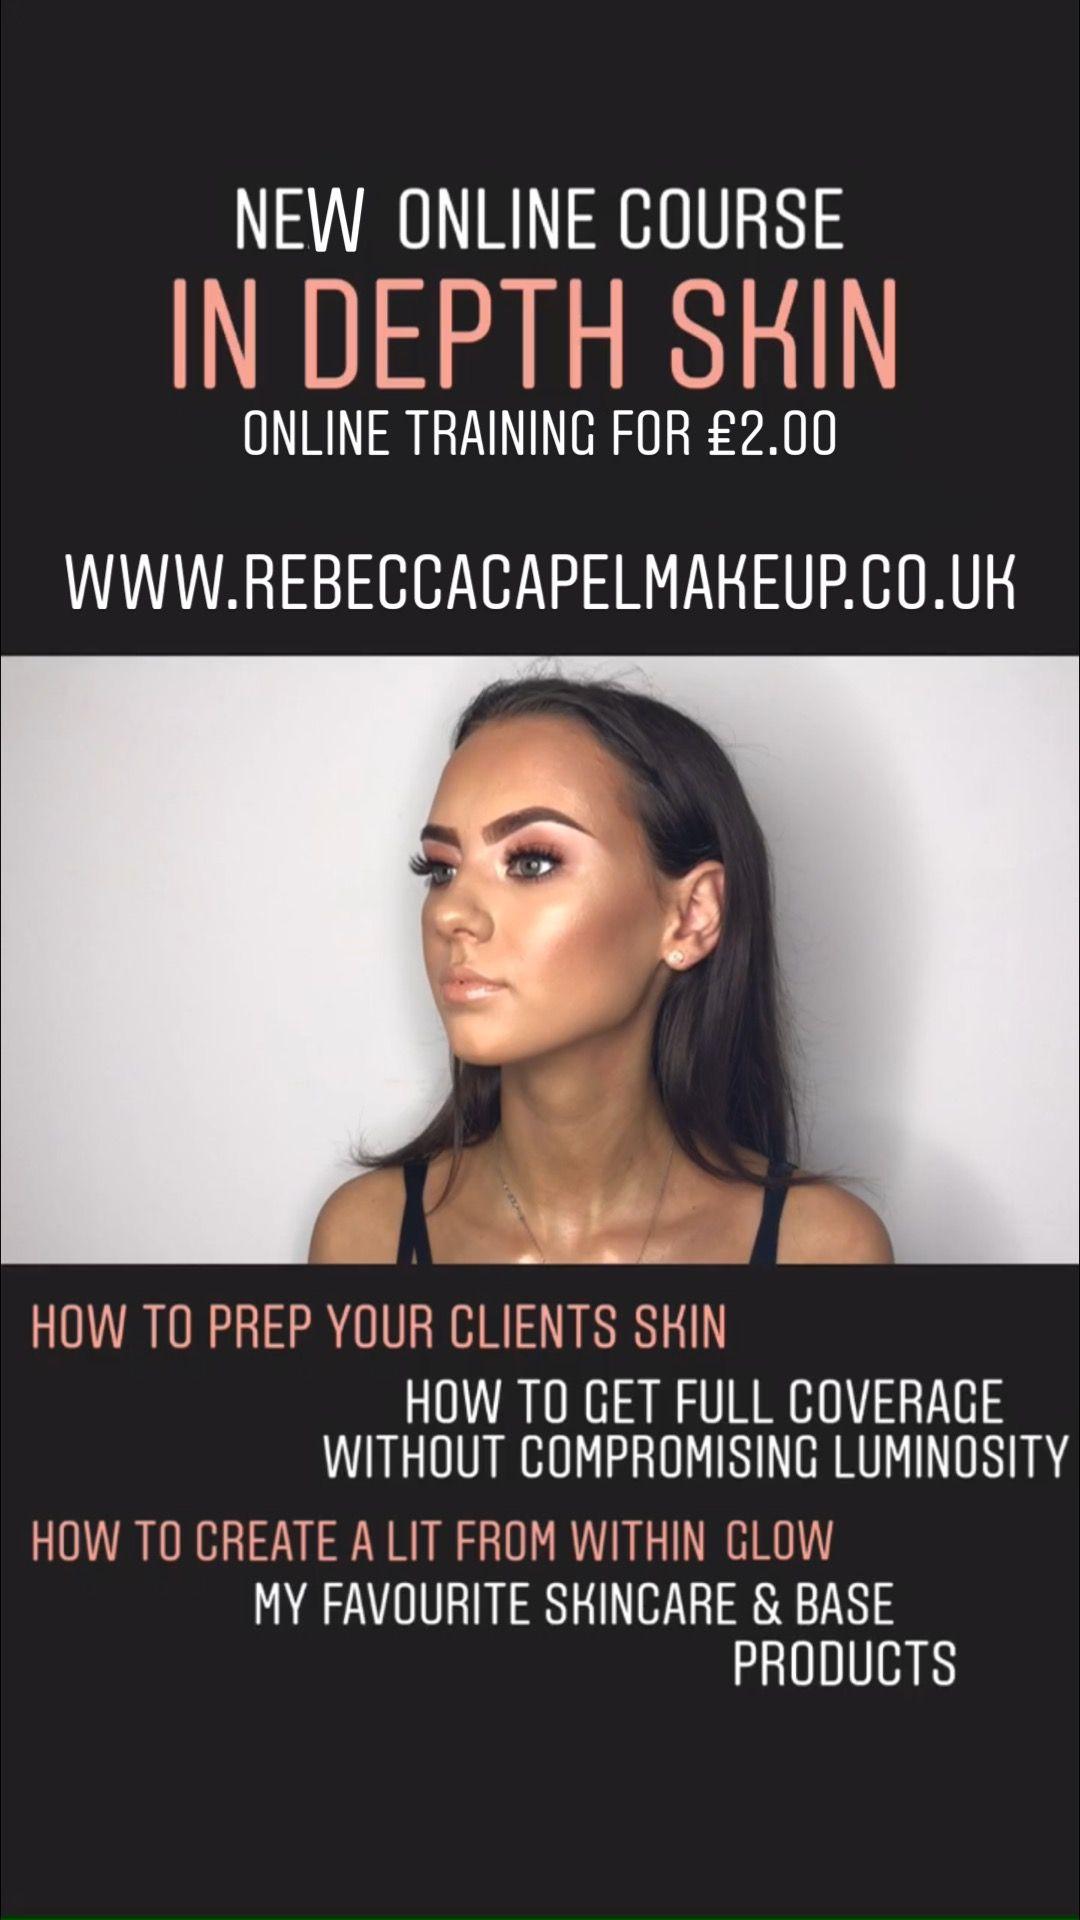 Http Www Rebeccacapelmakeup Co Uk Online Courses Html Online Makeup Courses Favorite Skincare Products Makeup Course